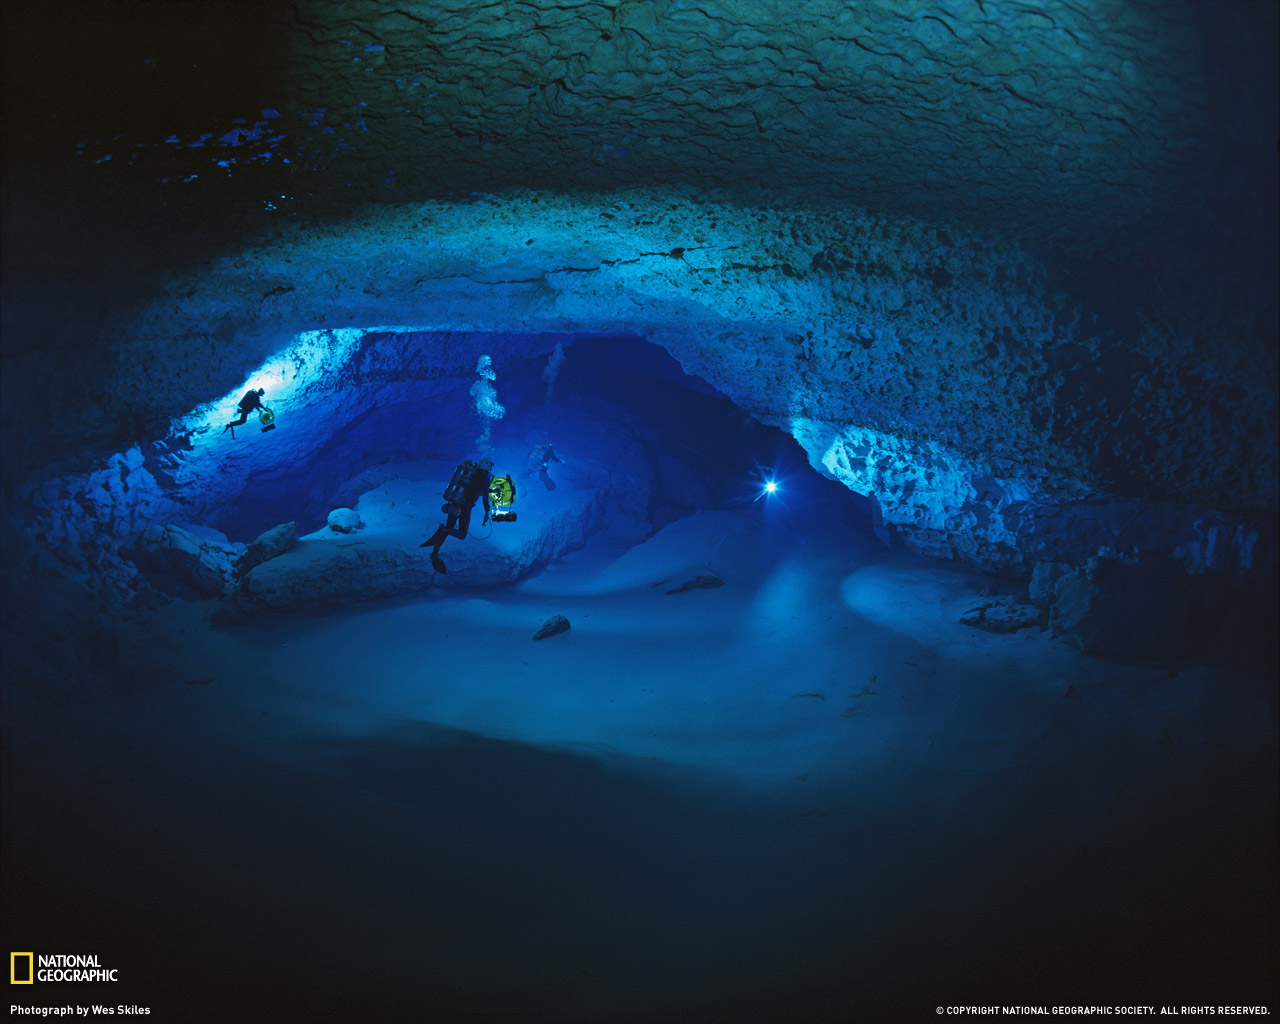 ocean wallpaper deep   HD Desktop Wallpapers 4k HD 1280x1024